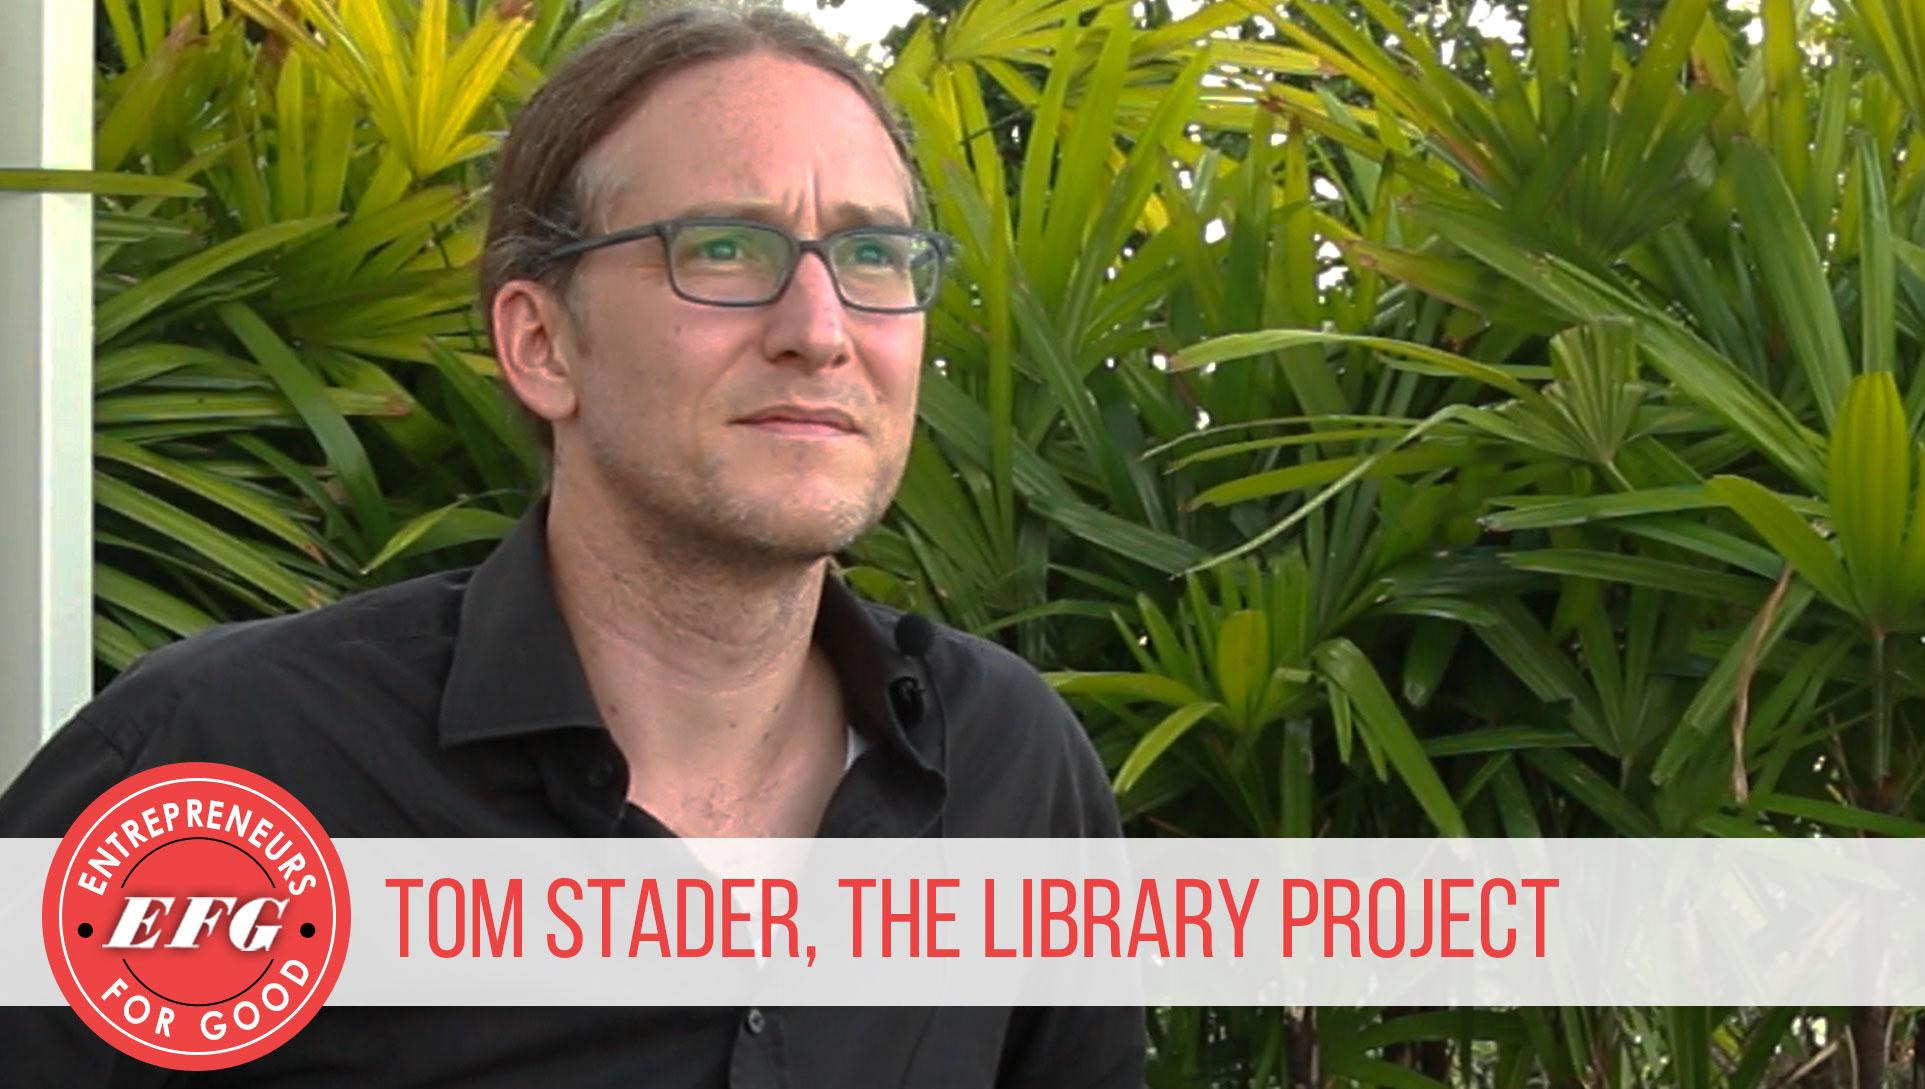 Tom Stader